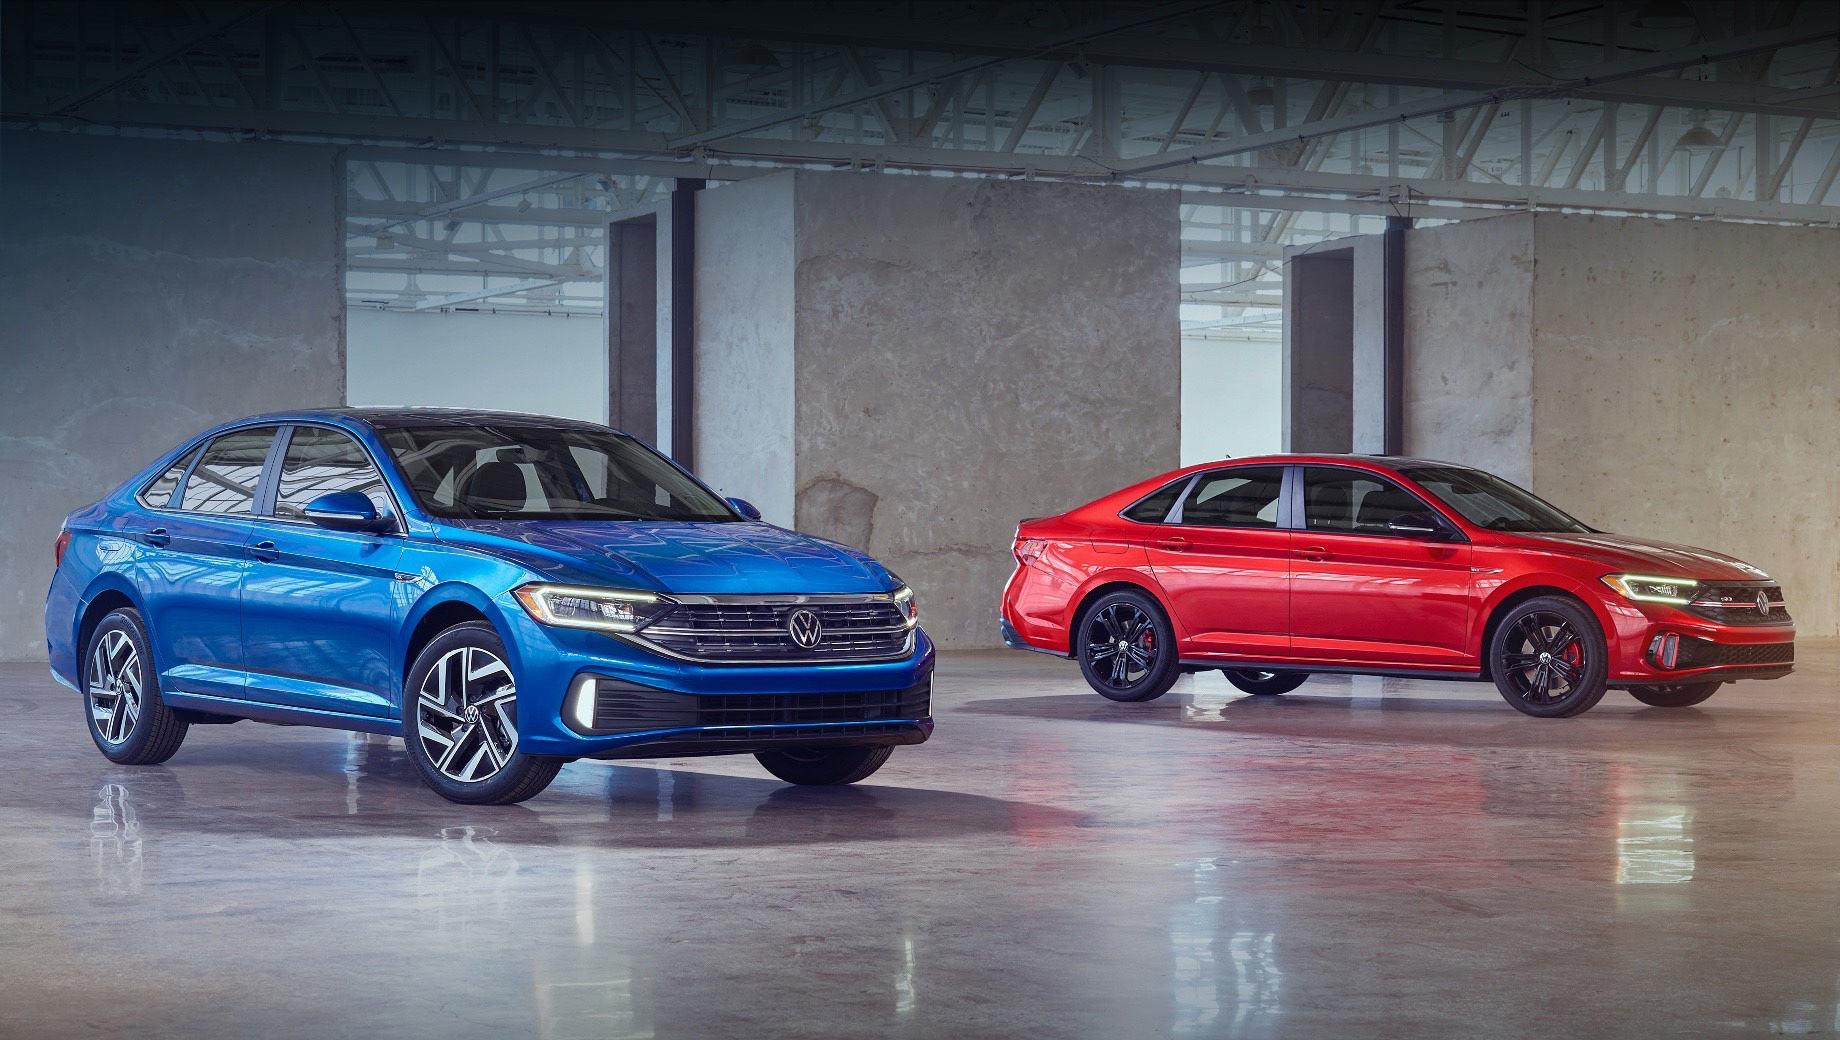 Седан Volkswagen Jetta в США оновився до нового мотора